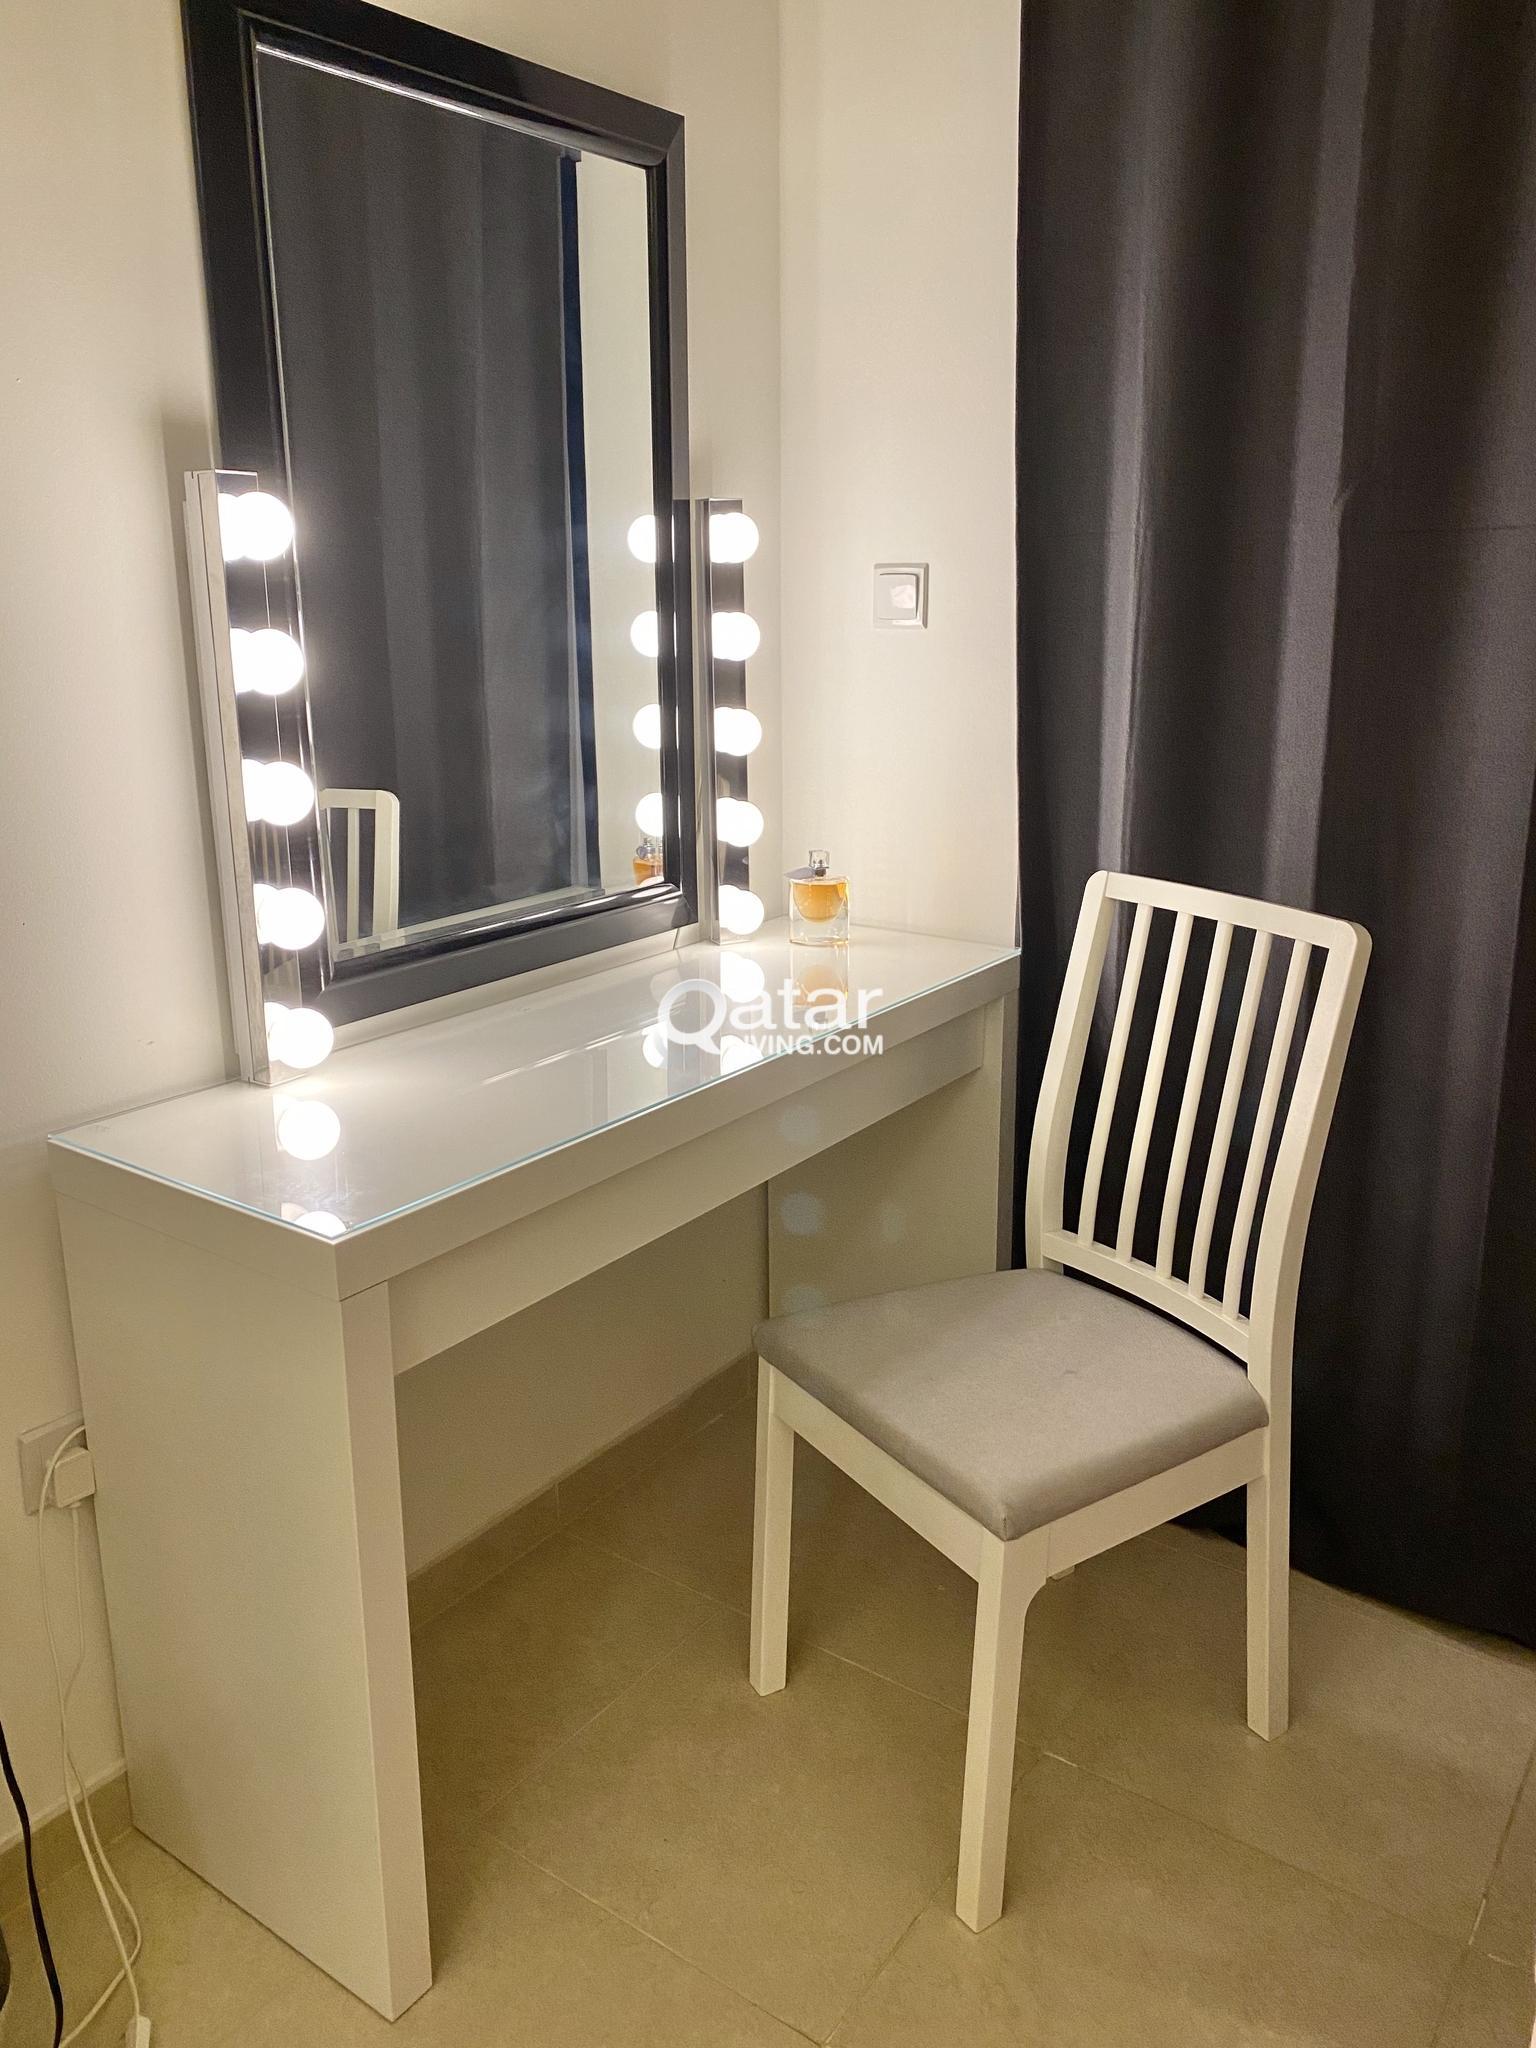 Vanity Chair Ikea No Lights Malm Dressing Table Ekedalen Chair Qatar Living